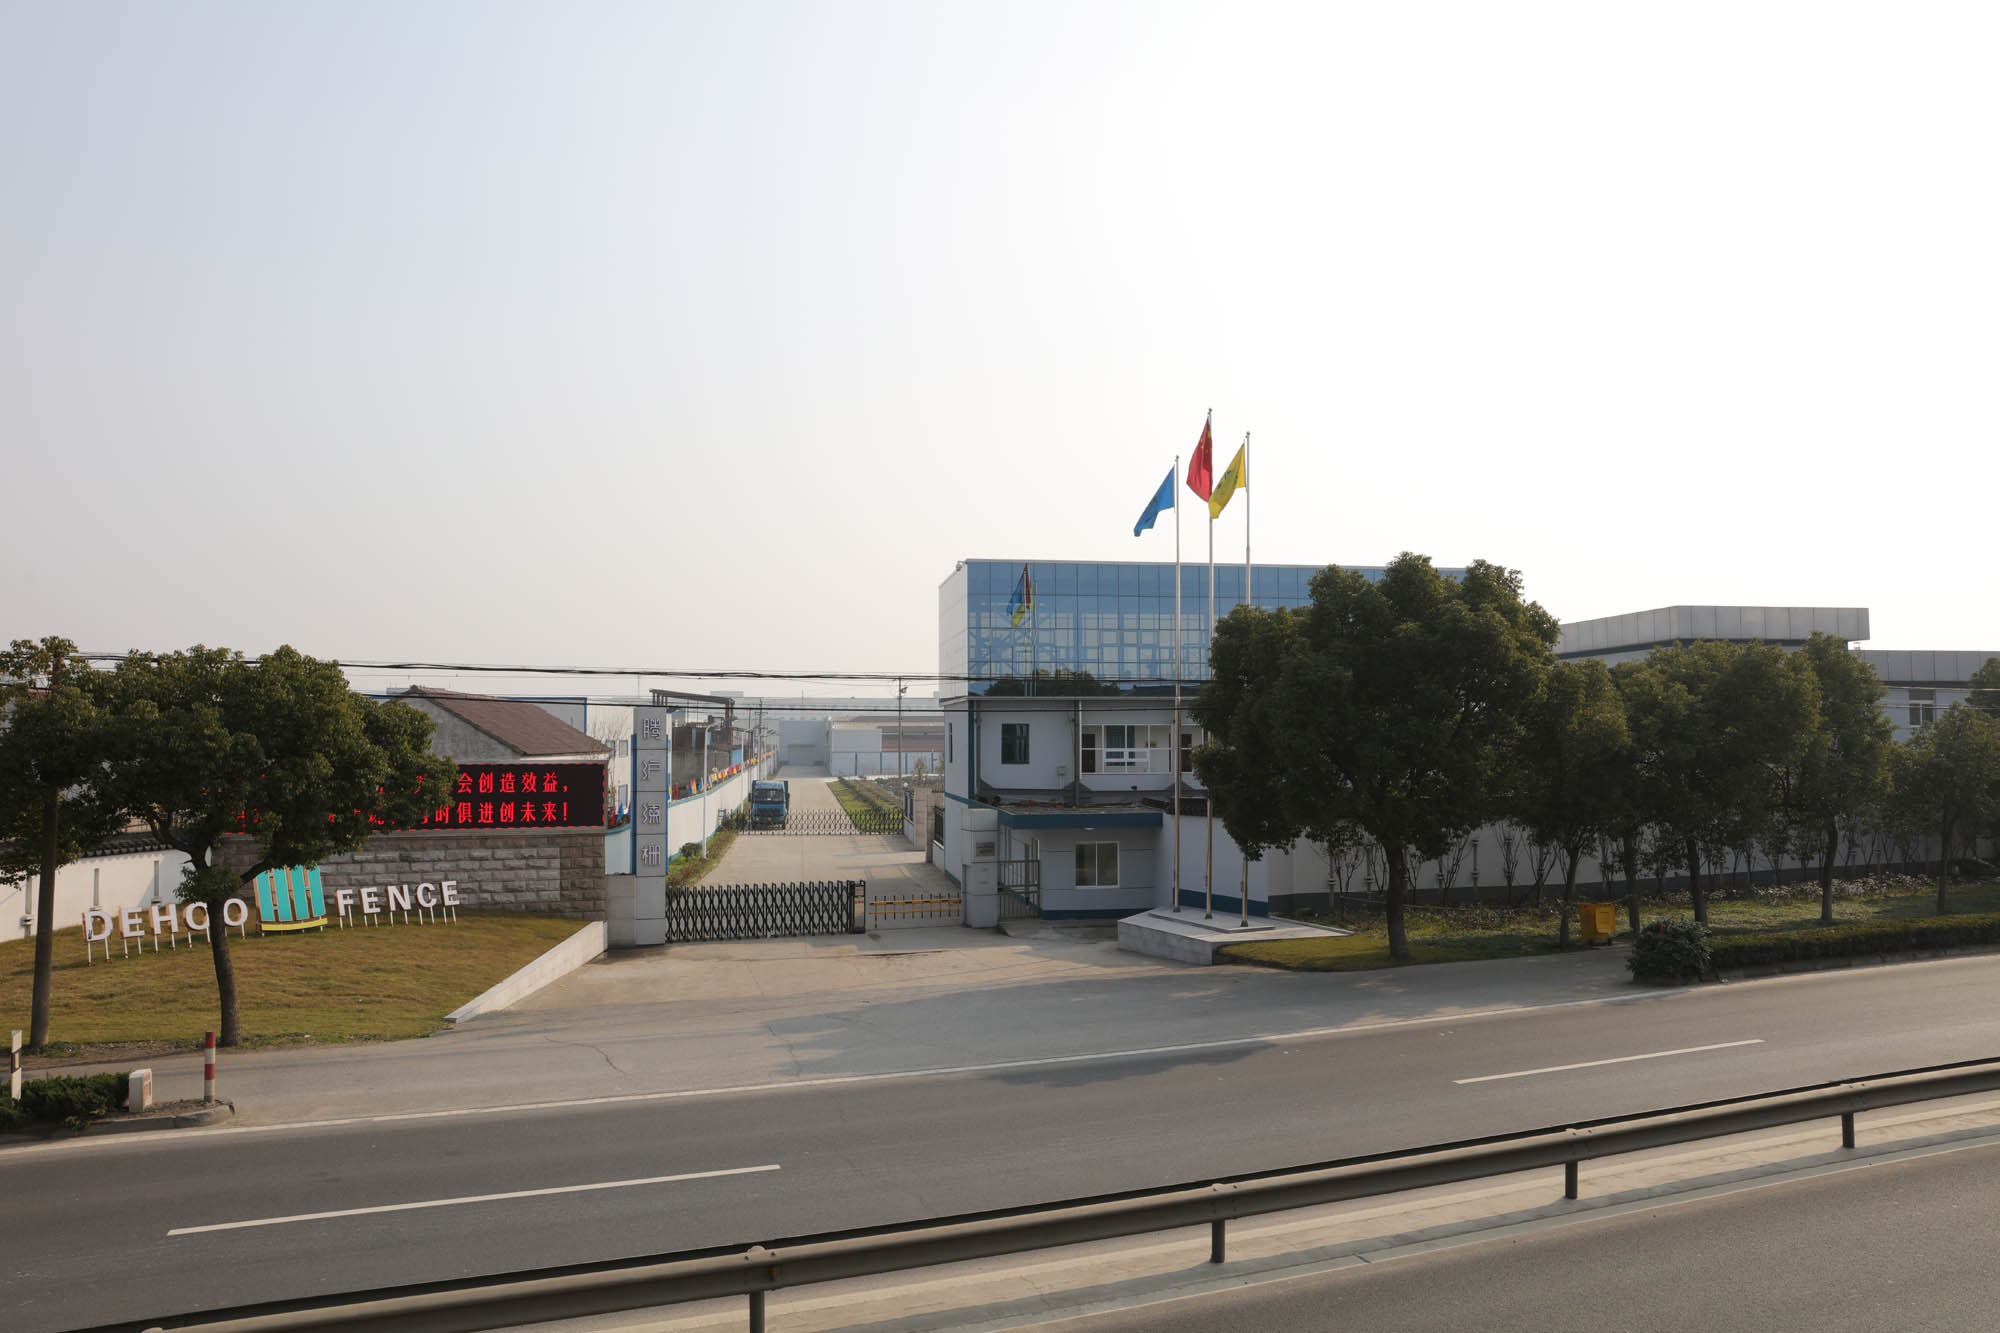 DEHOO Gate